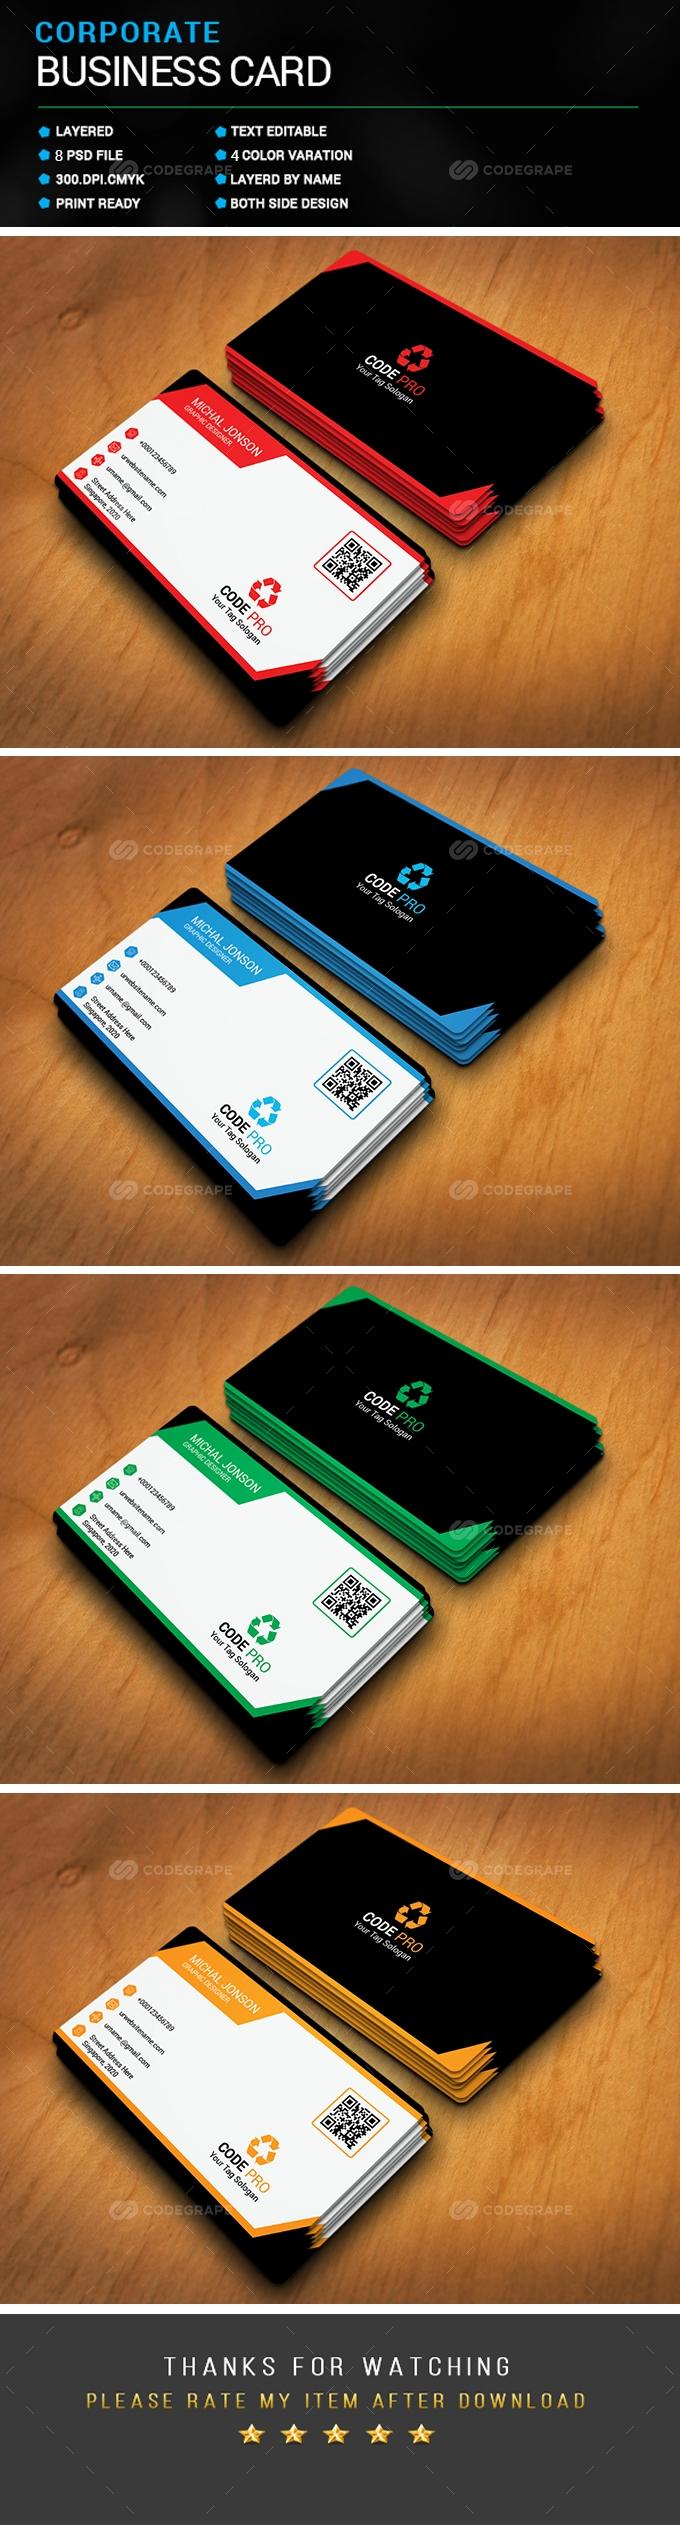 Corporate Business Card 4